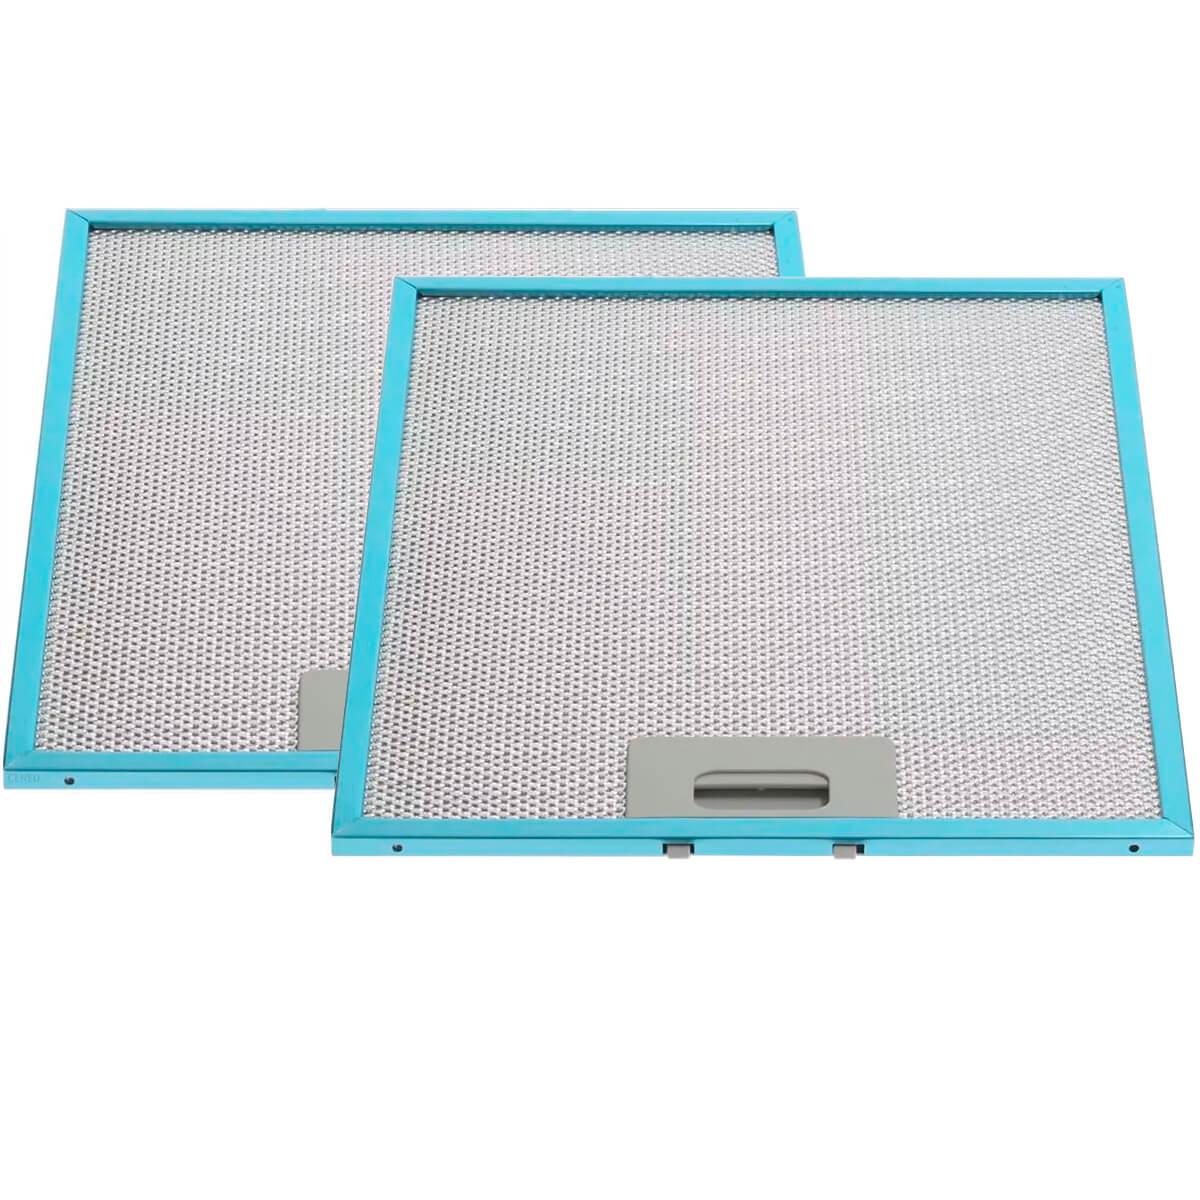 Kit Com 2 Filtros De Alumínio Coifa Depurador Electrolux CE60X CE90X - 1010GY